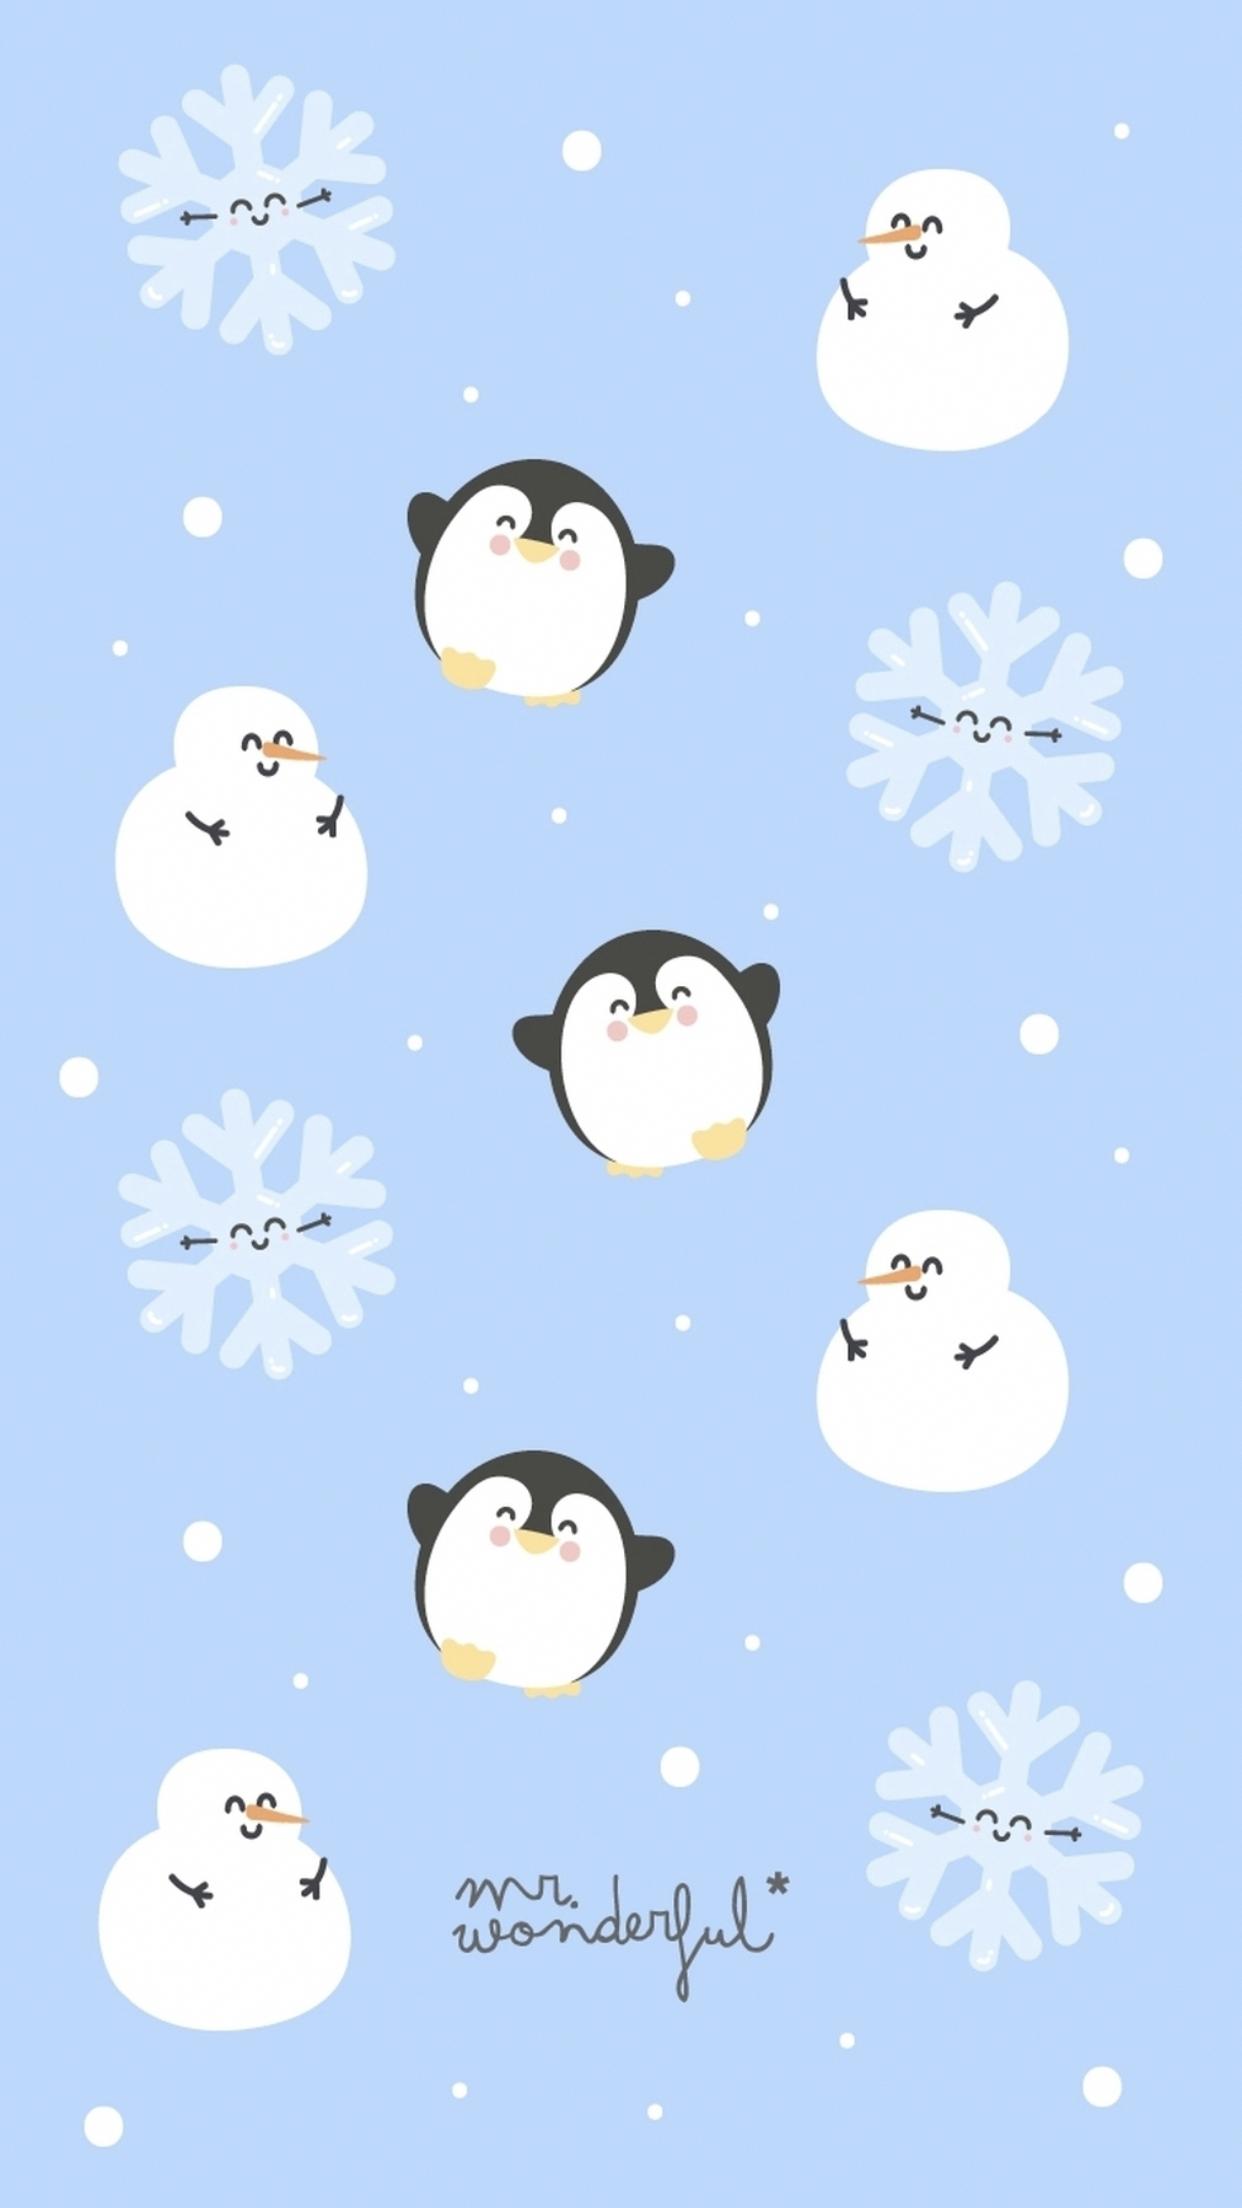 mrwonderful mrwonderfulwallpaper christmas